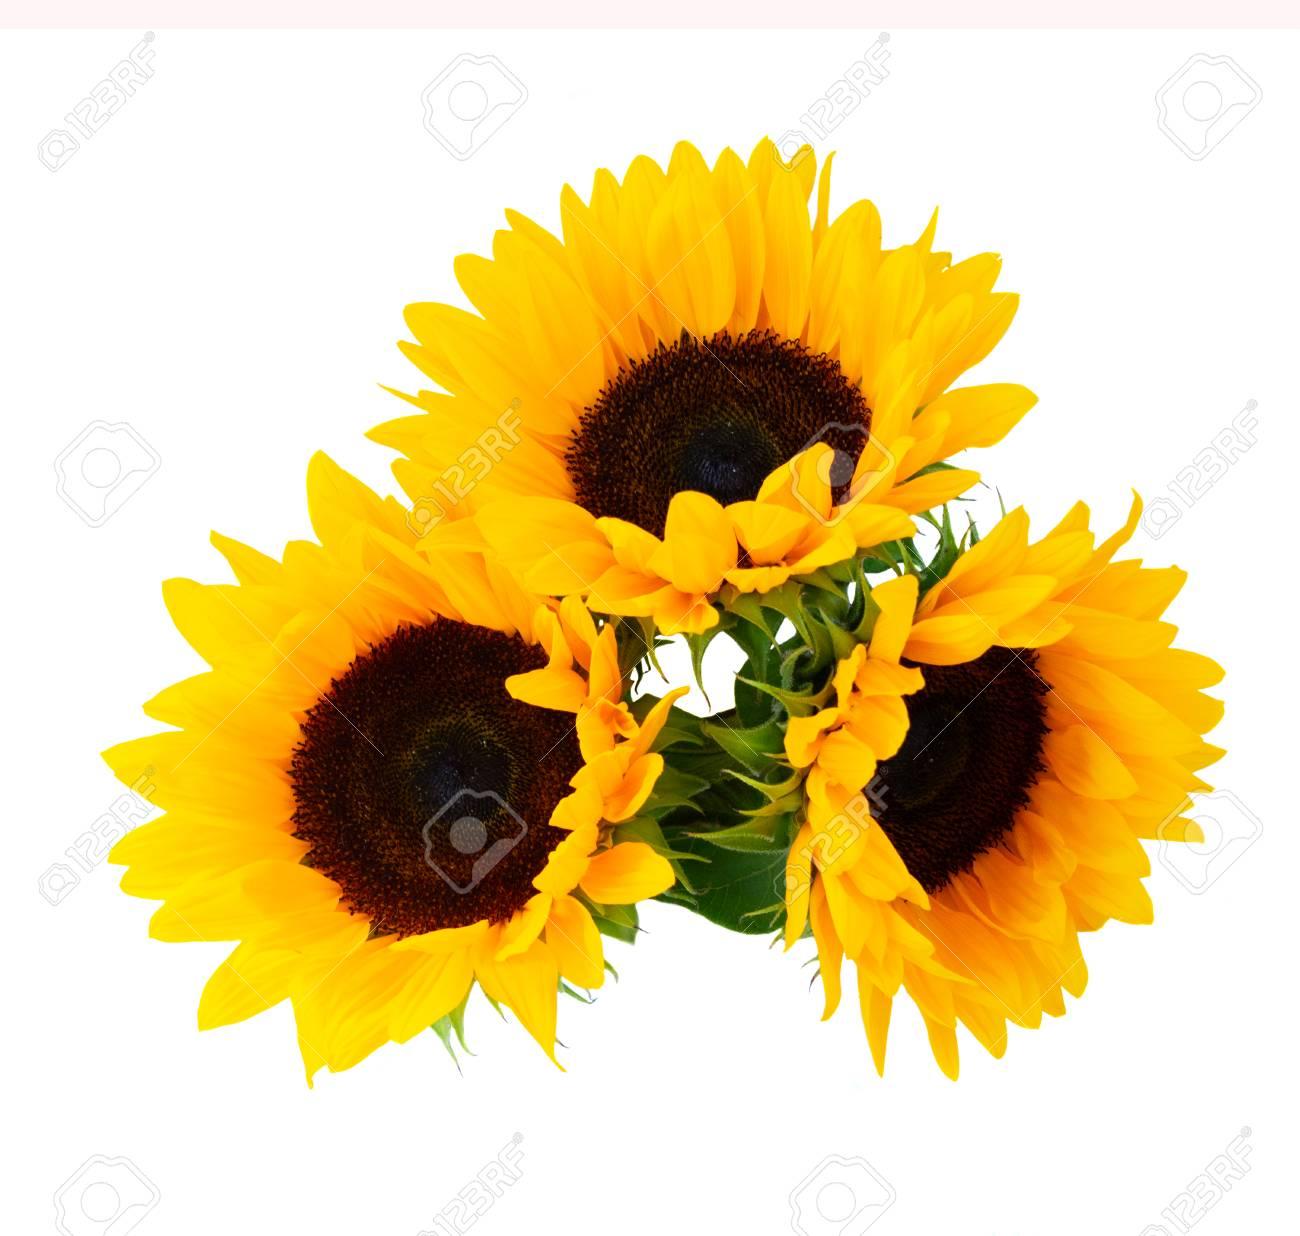 Sunflowers fresh flowers three heads isolated on white background - 122631328